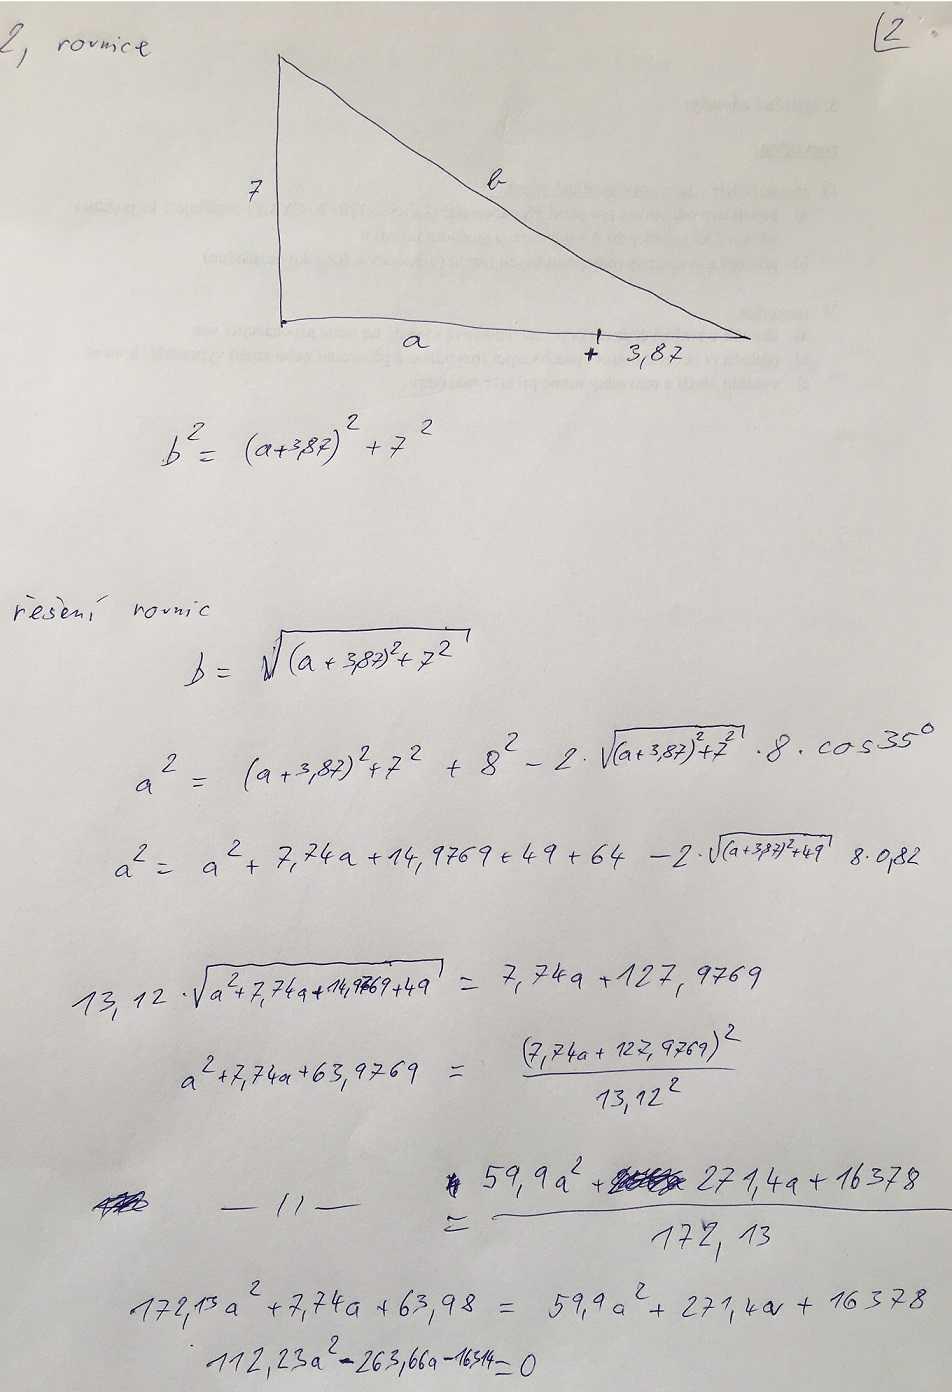 http://forum.matematika.cz/upload3/img/2017-08/85255_%25282%2529.JPG